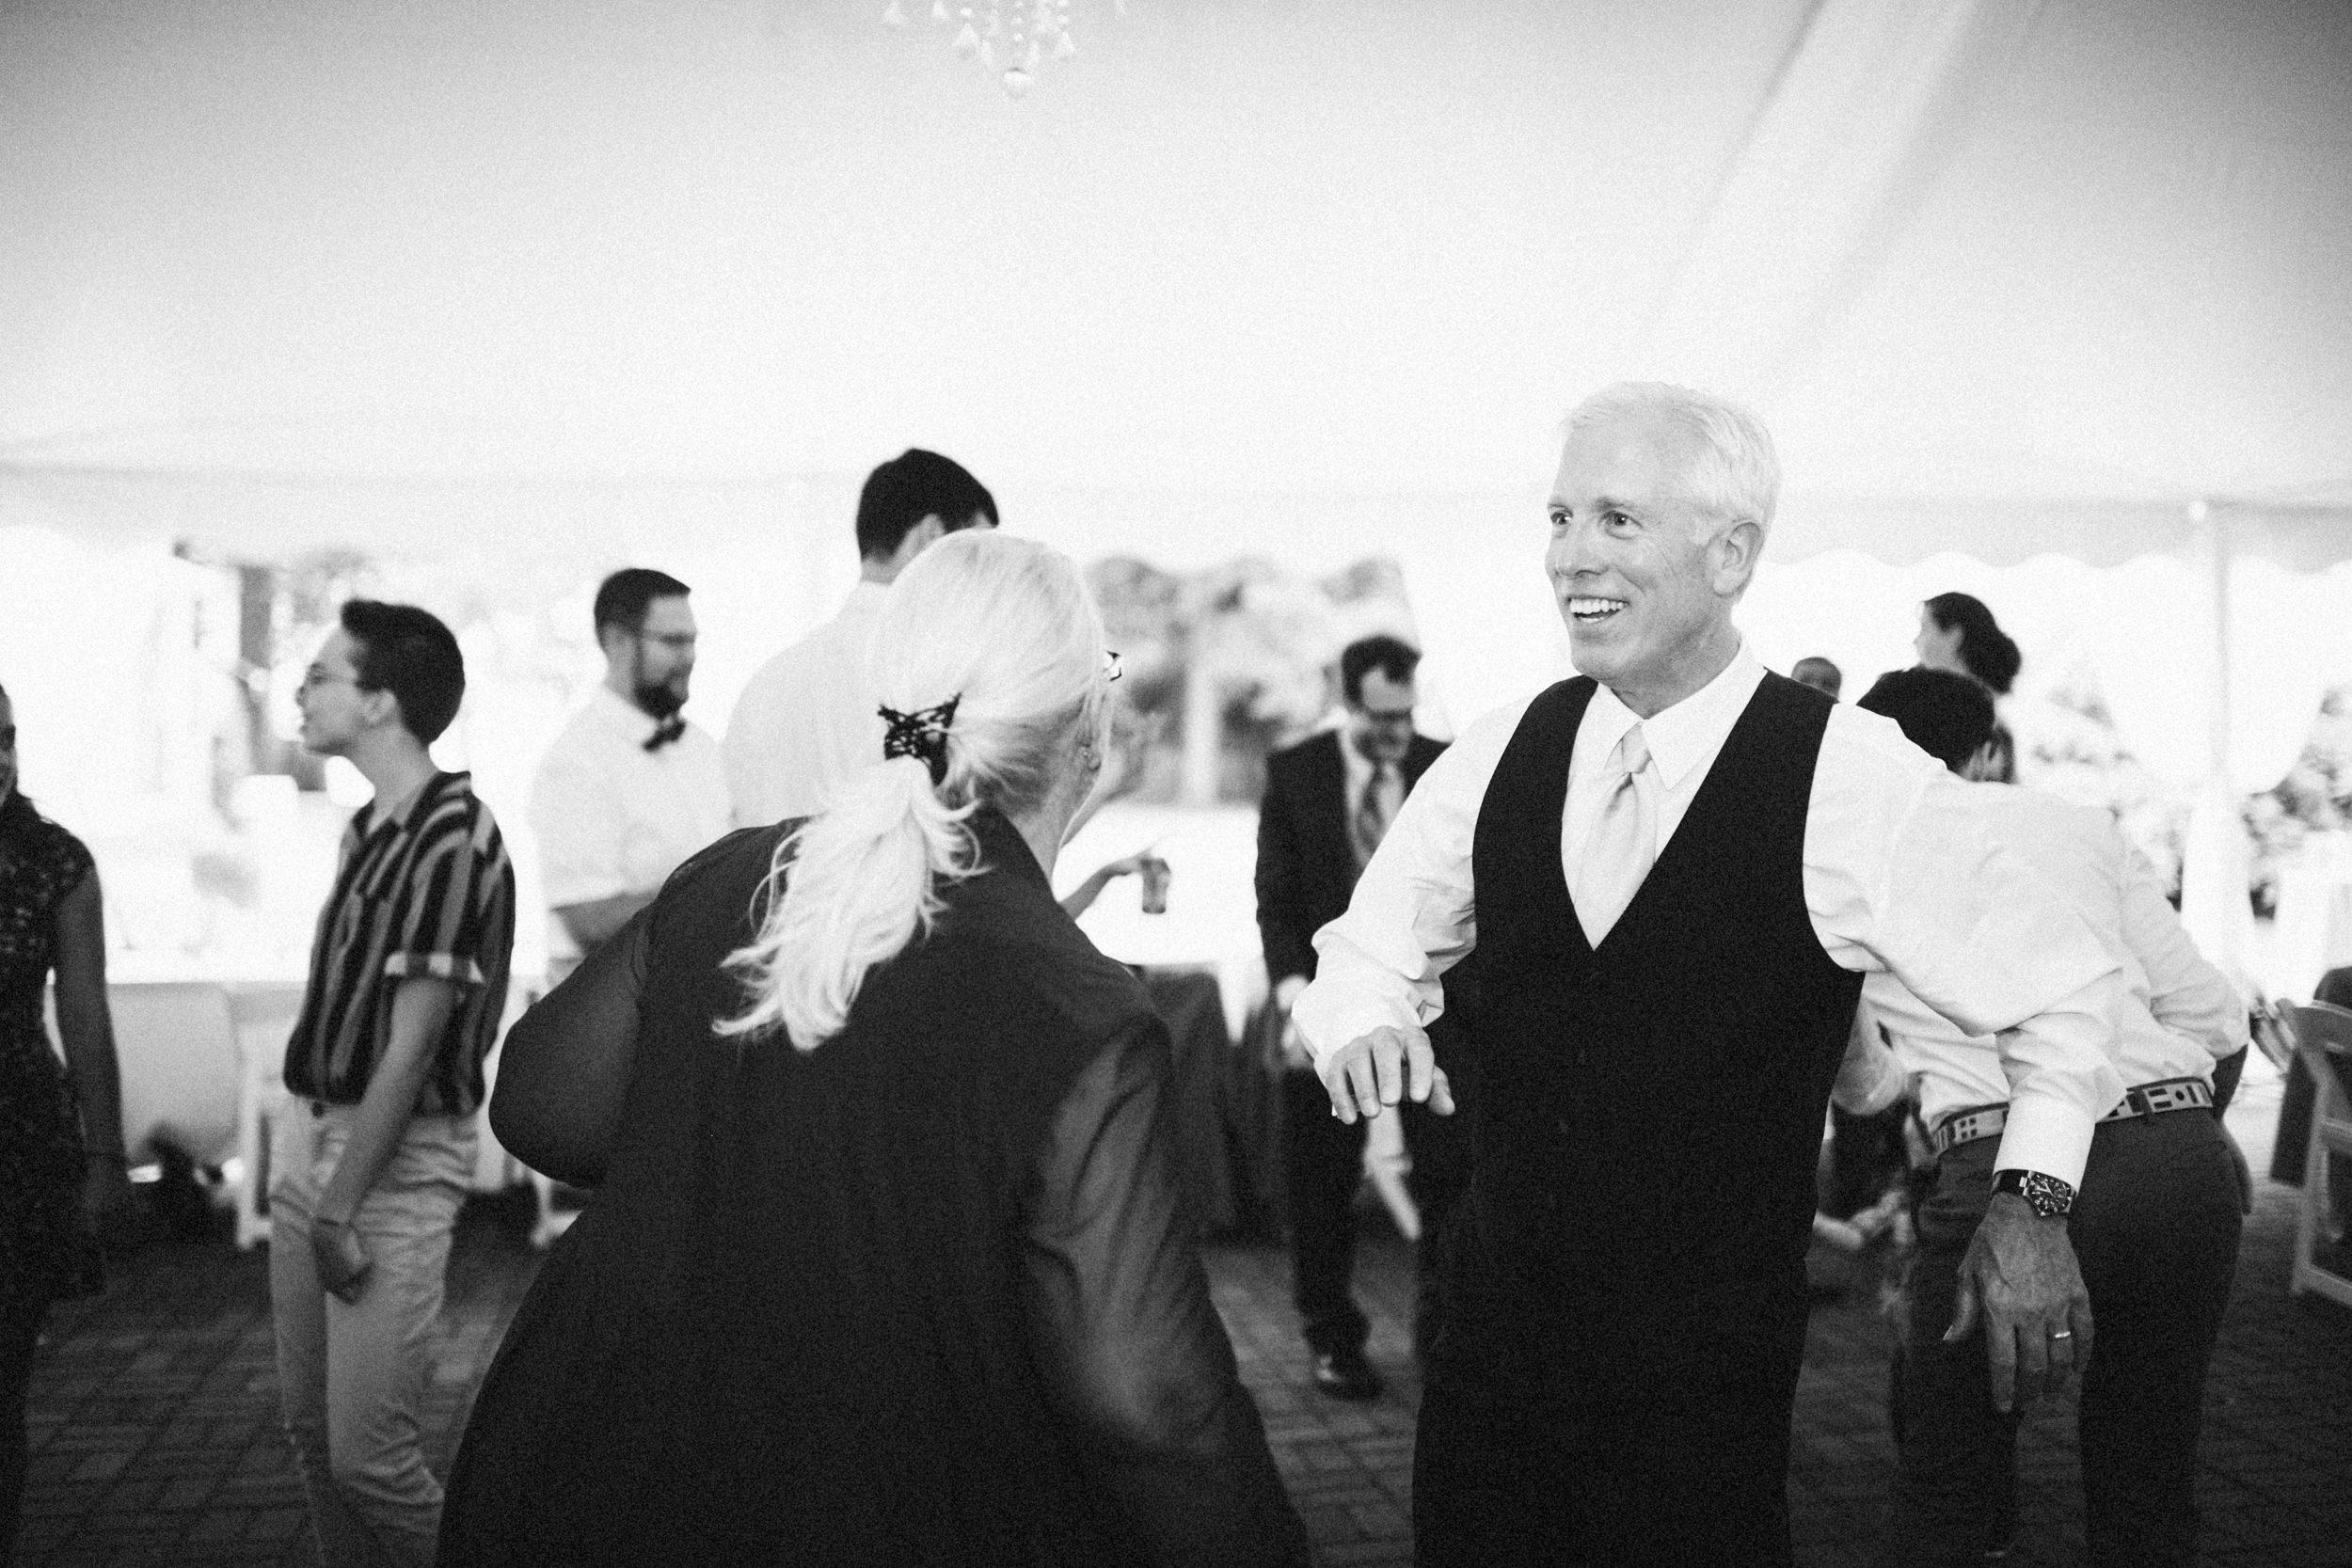 Louisville-Kentucky-Wedding-Elopement-Photographer-Sarah-Katherine-Davis-Photography-Whitehall-Classic-Timeless-Garden-Wedding-760.jpg